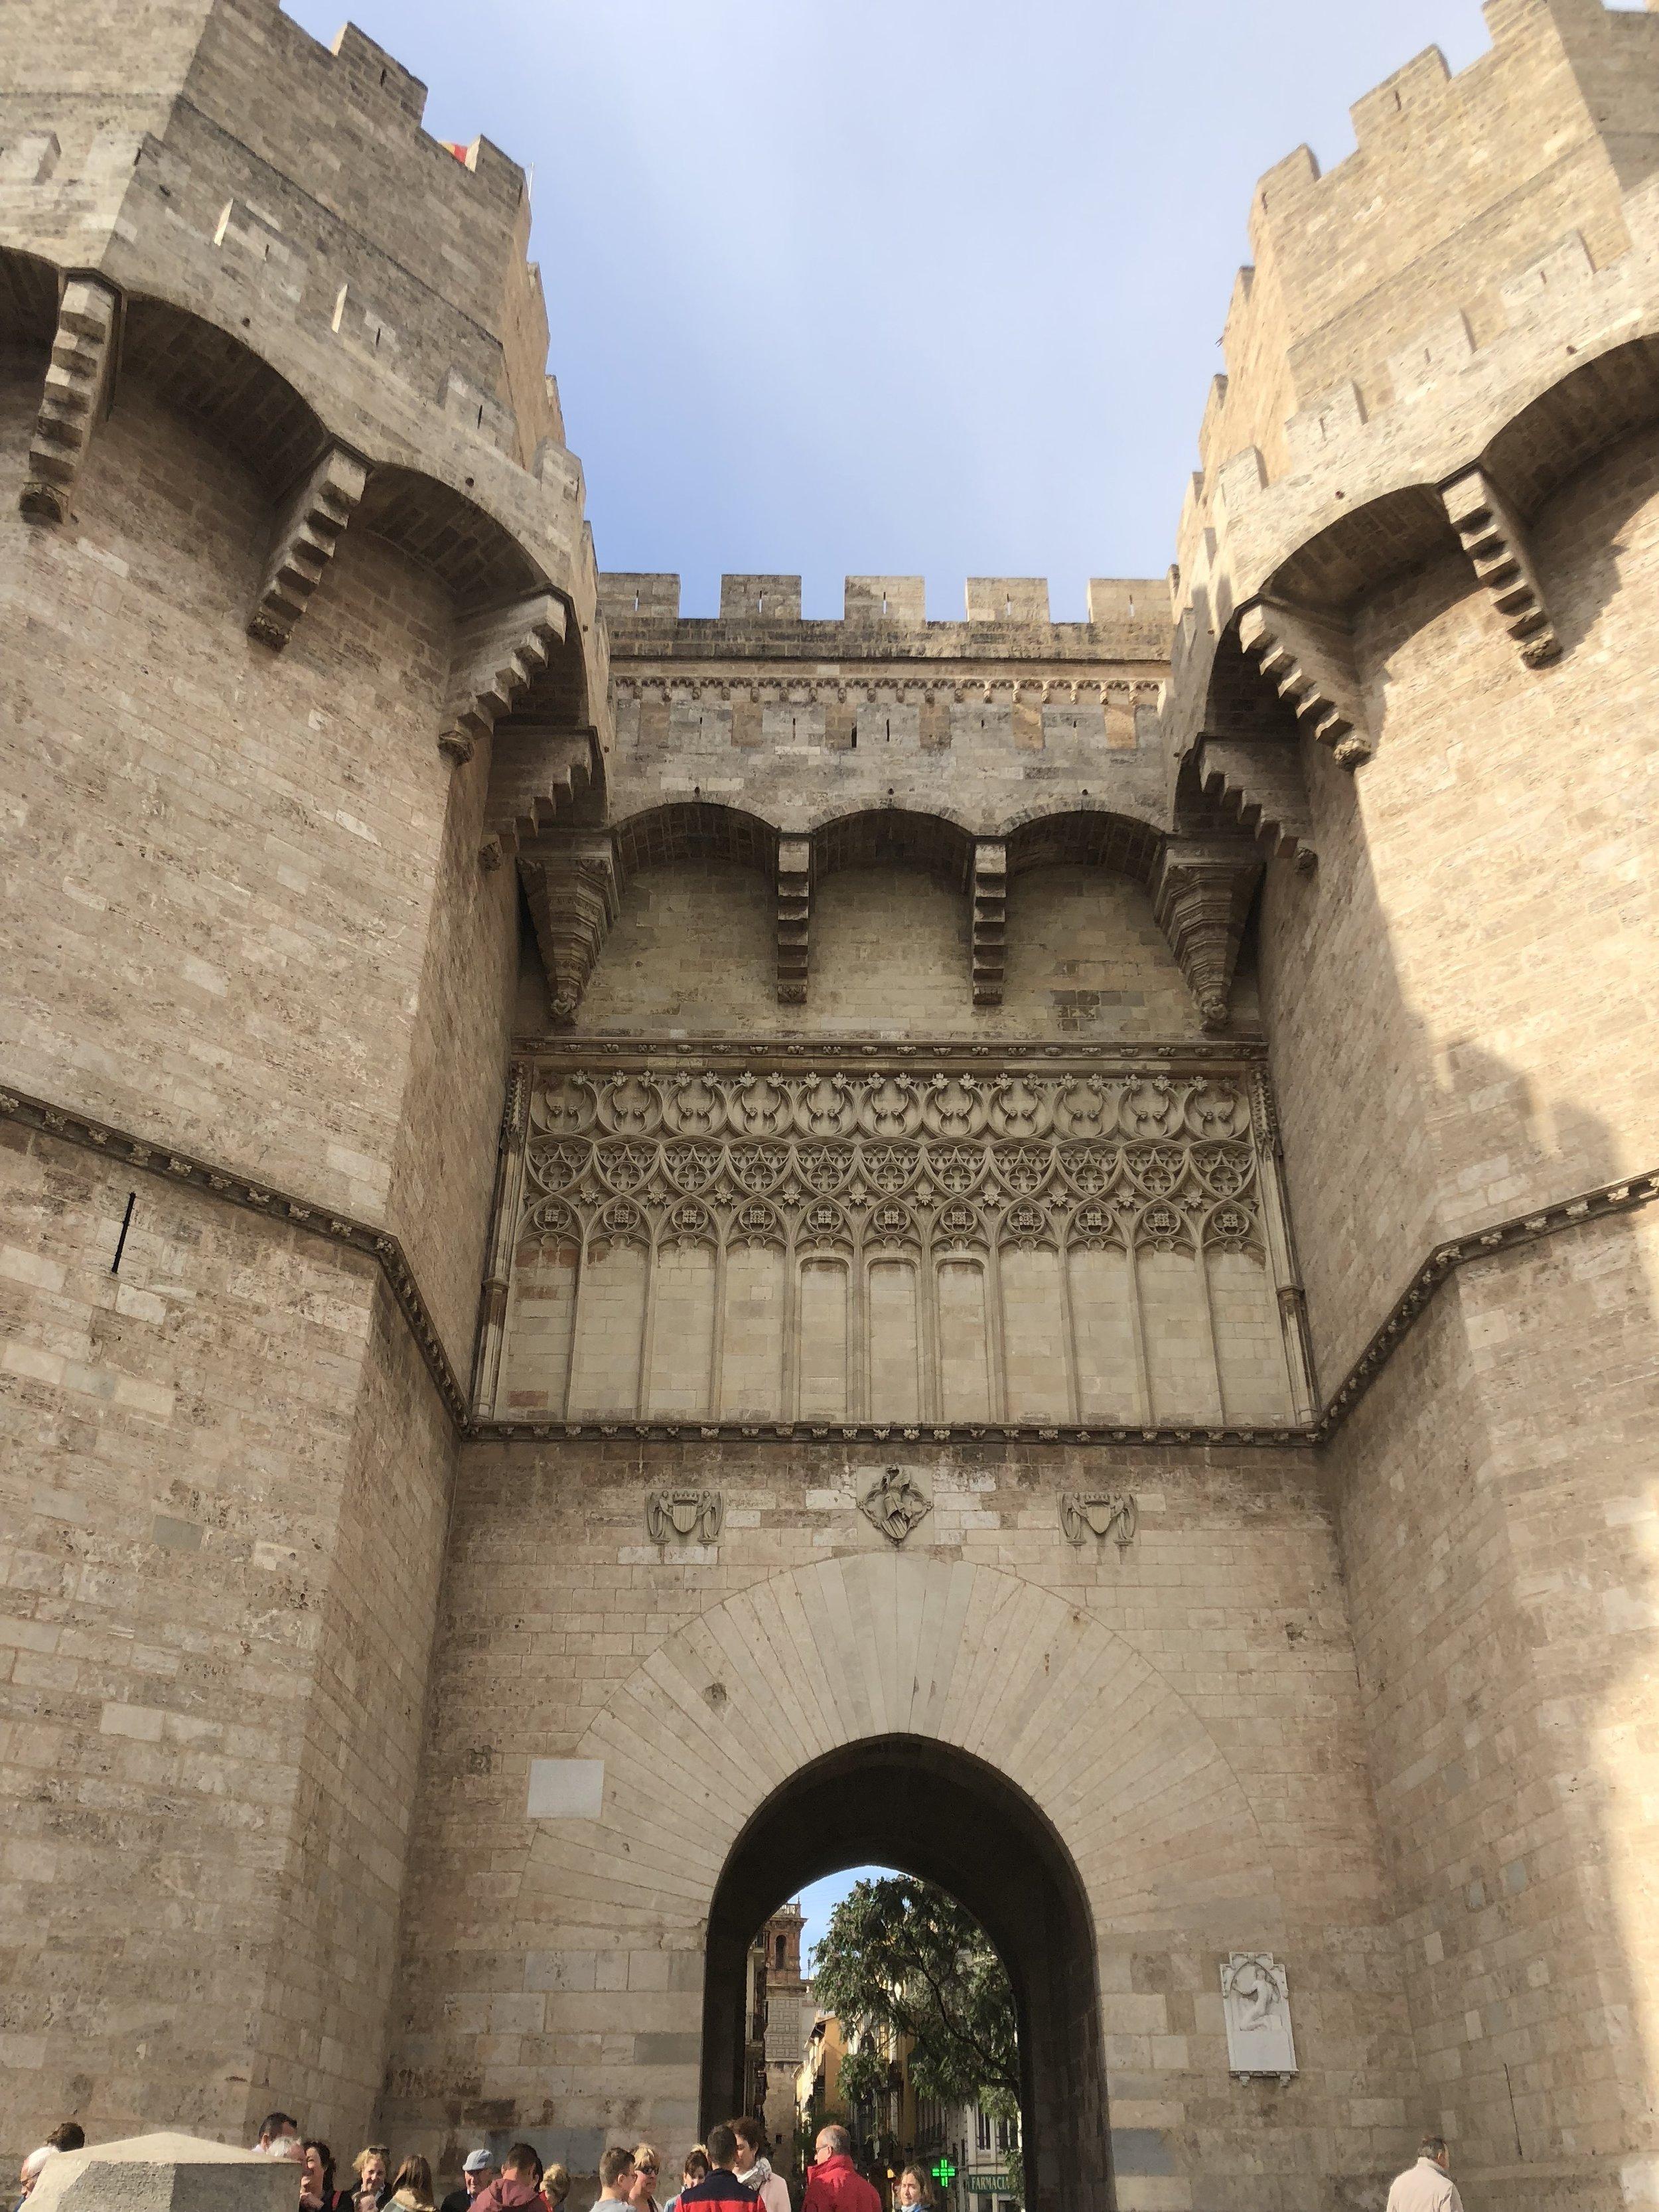 Castle gates all around the city.